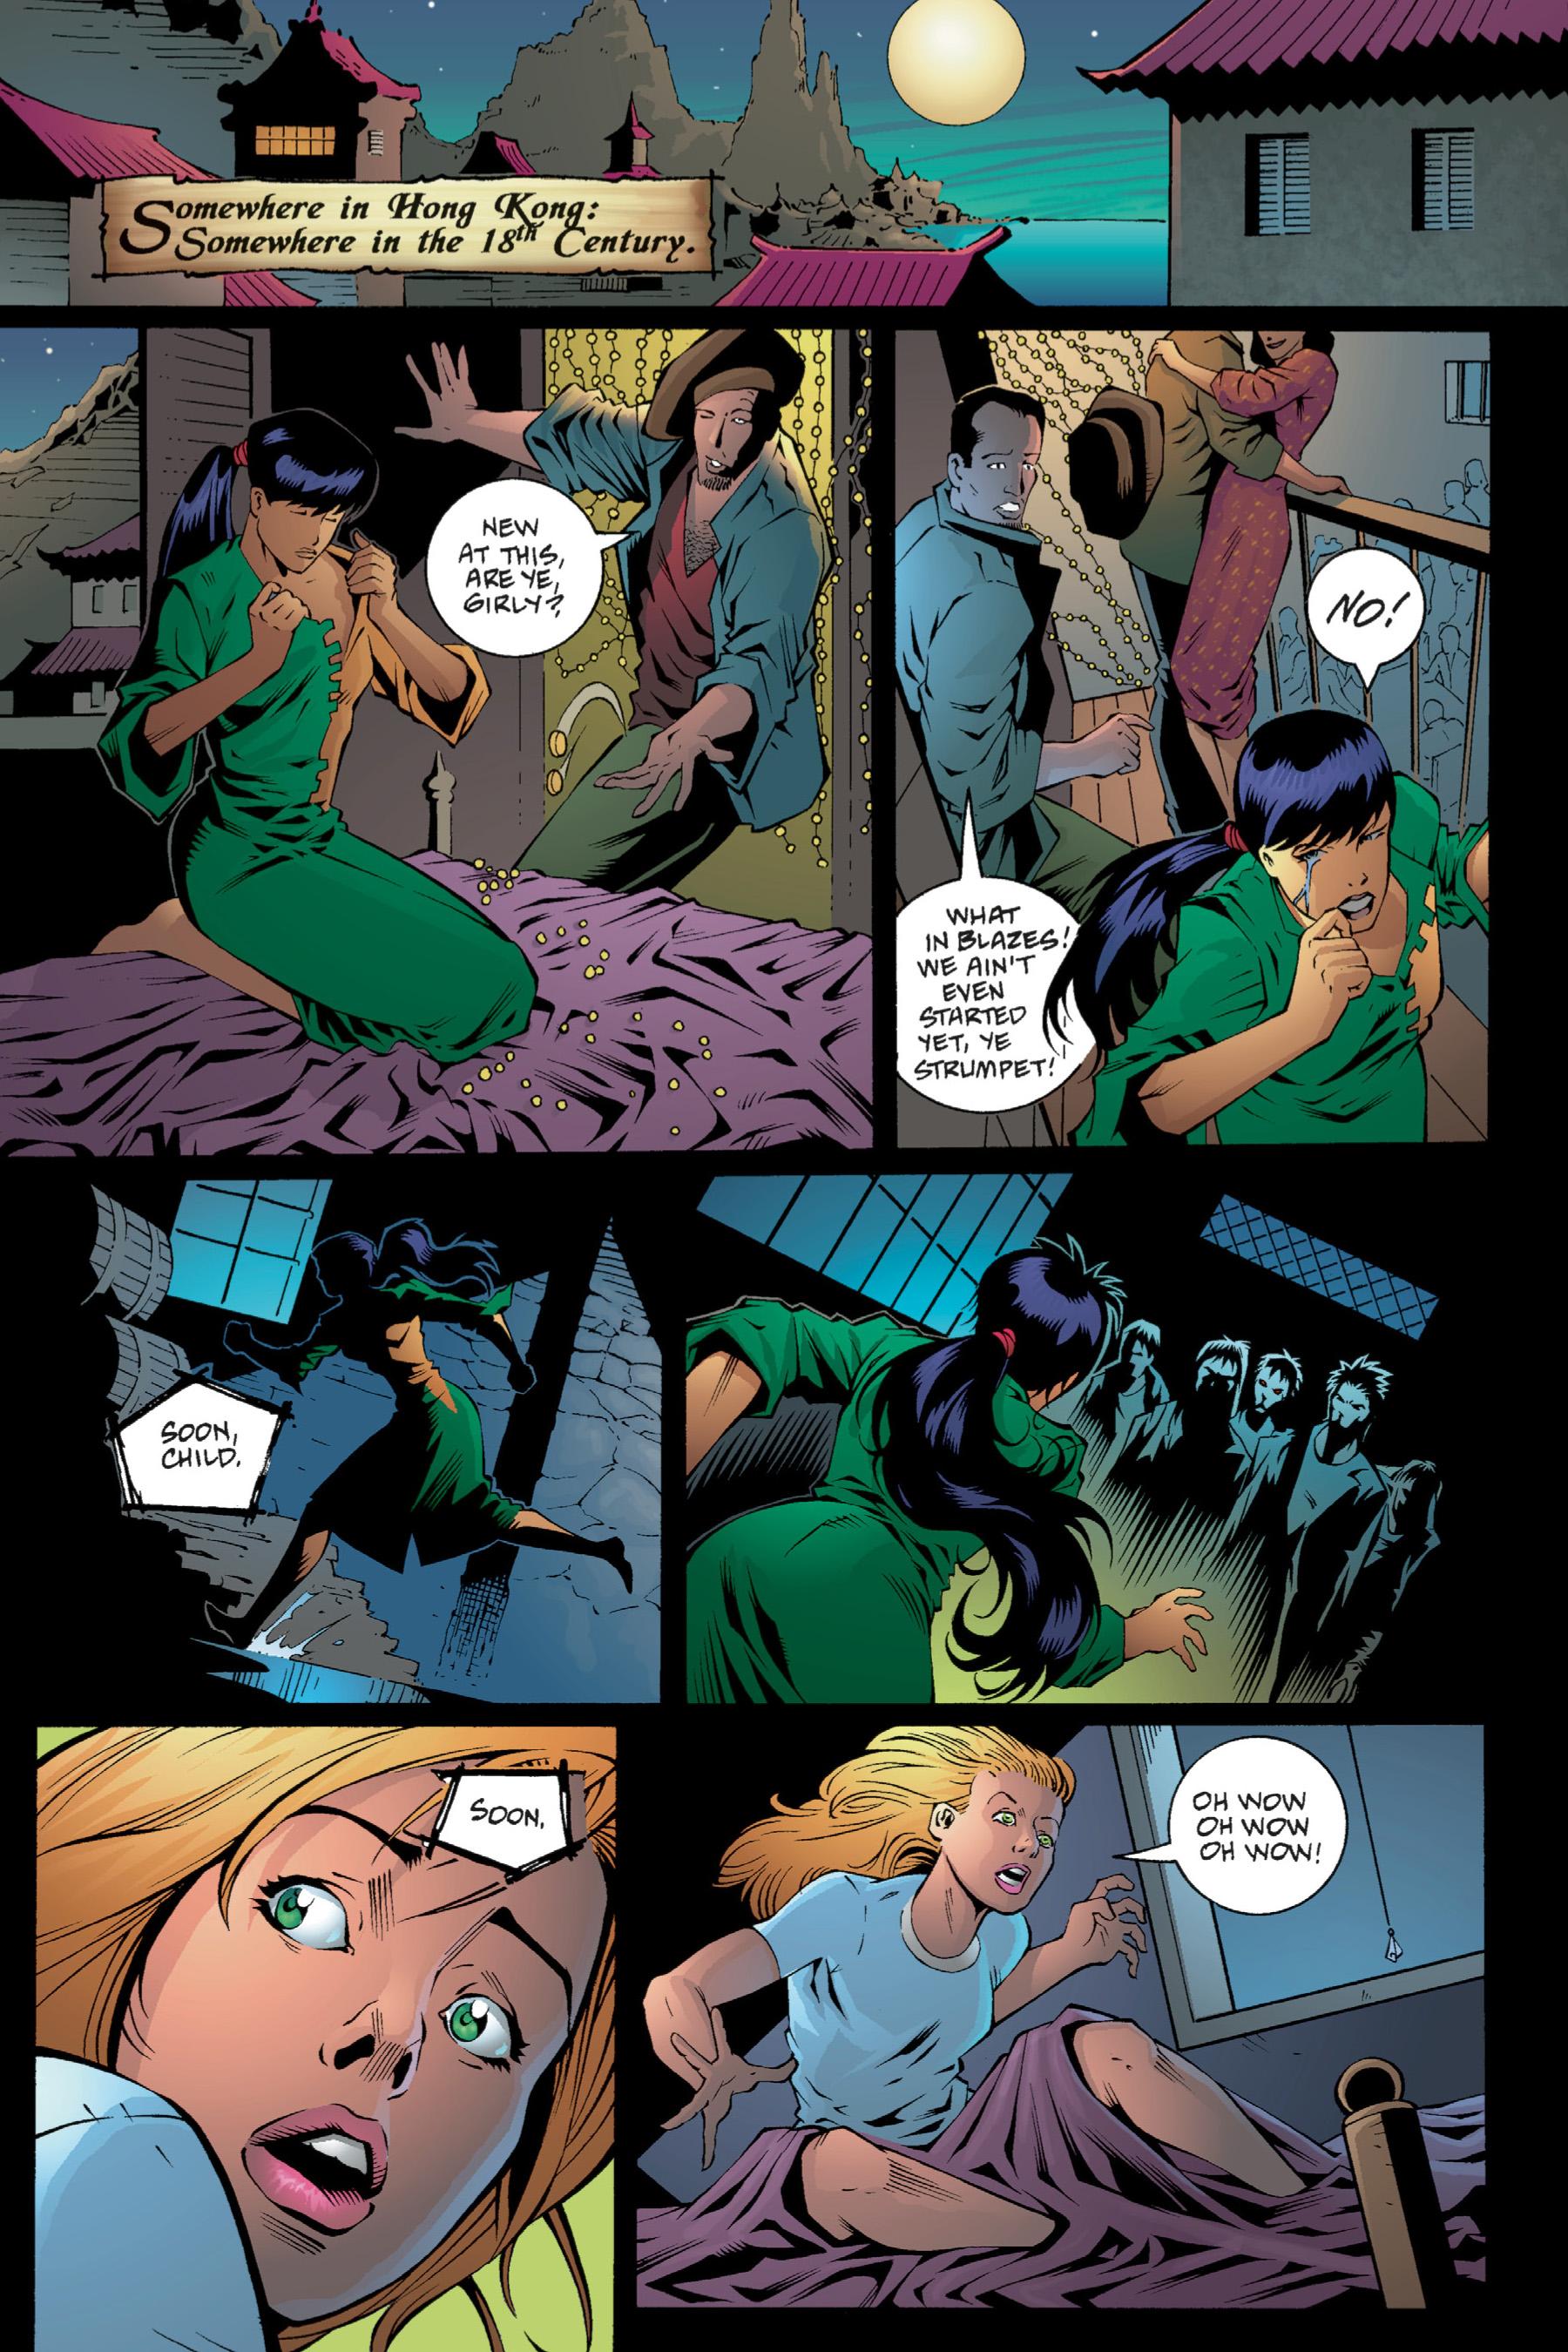 Read online Buffy the Vampire Slayer: Omnibus comic -  Issue # TPB 1 - 44